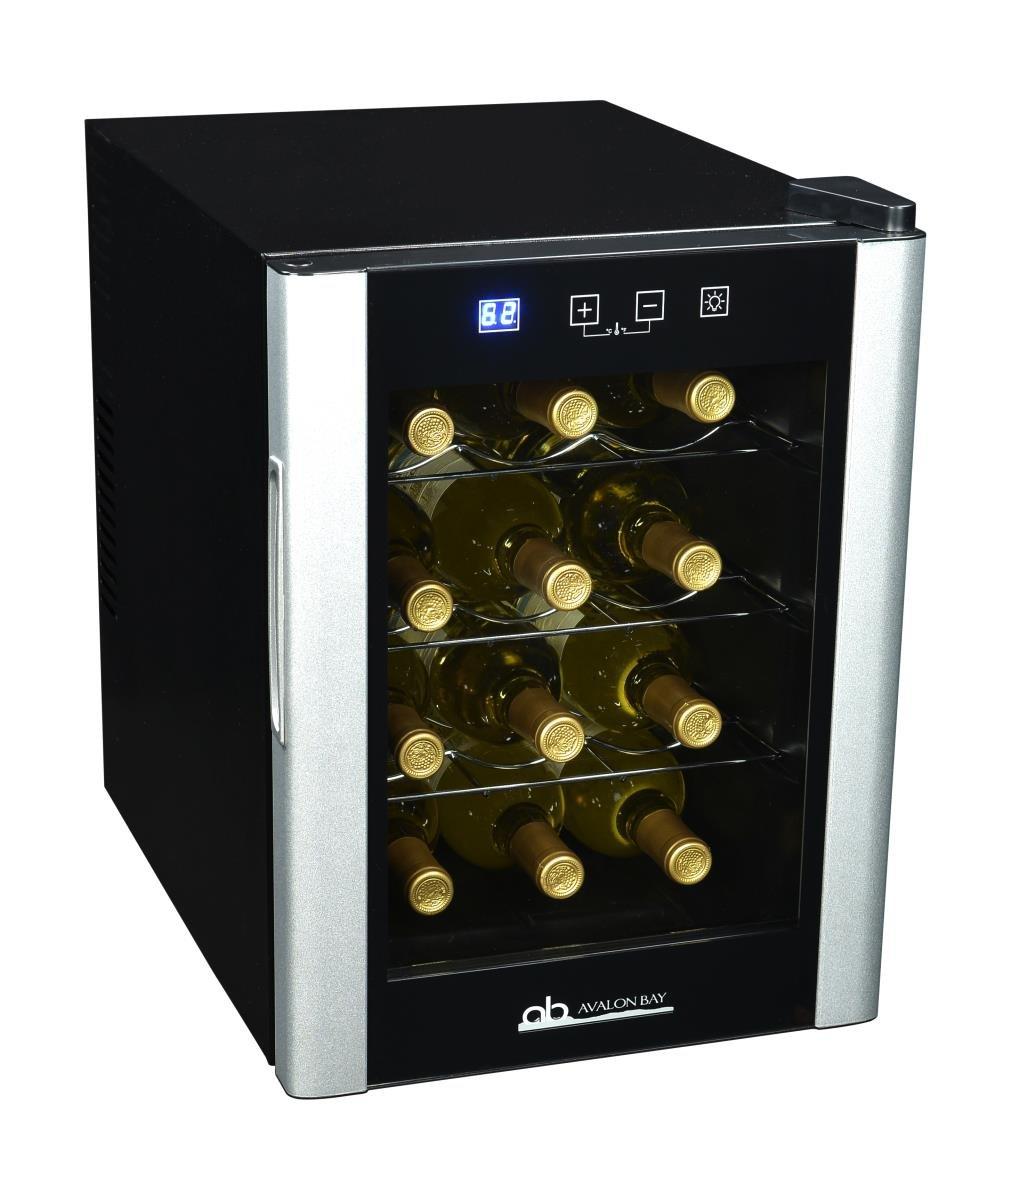 Avalon Bay AB-Wine27DS Wine Cooler 27 Bottle Black//Stainless Steel